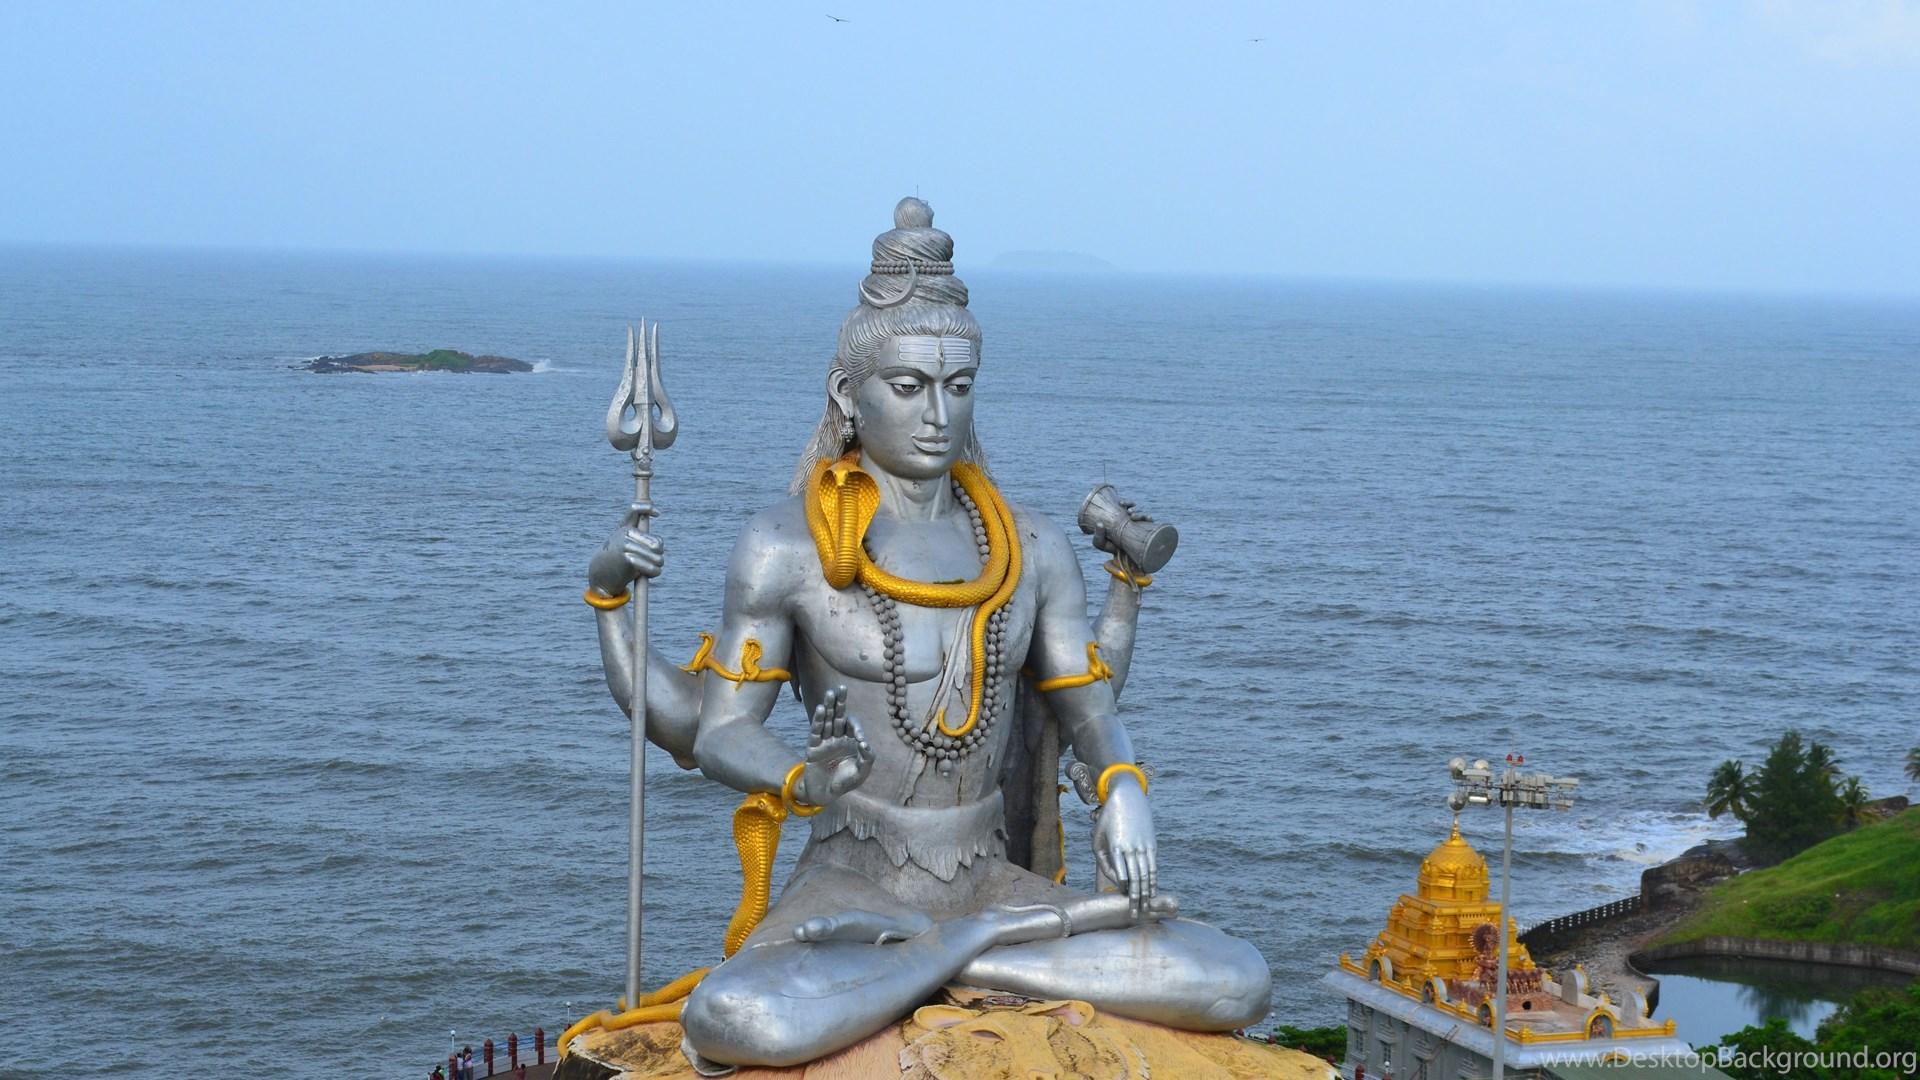 1366x768 Lord Shiva Desktop Background: Lord Shiva Murudeshwar Wallpapers Desktop Background